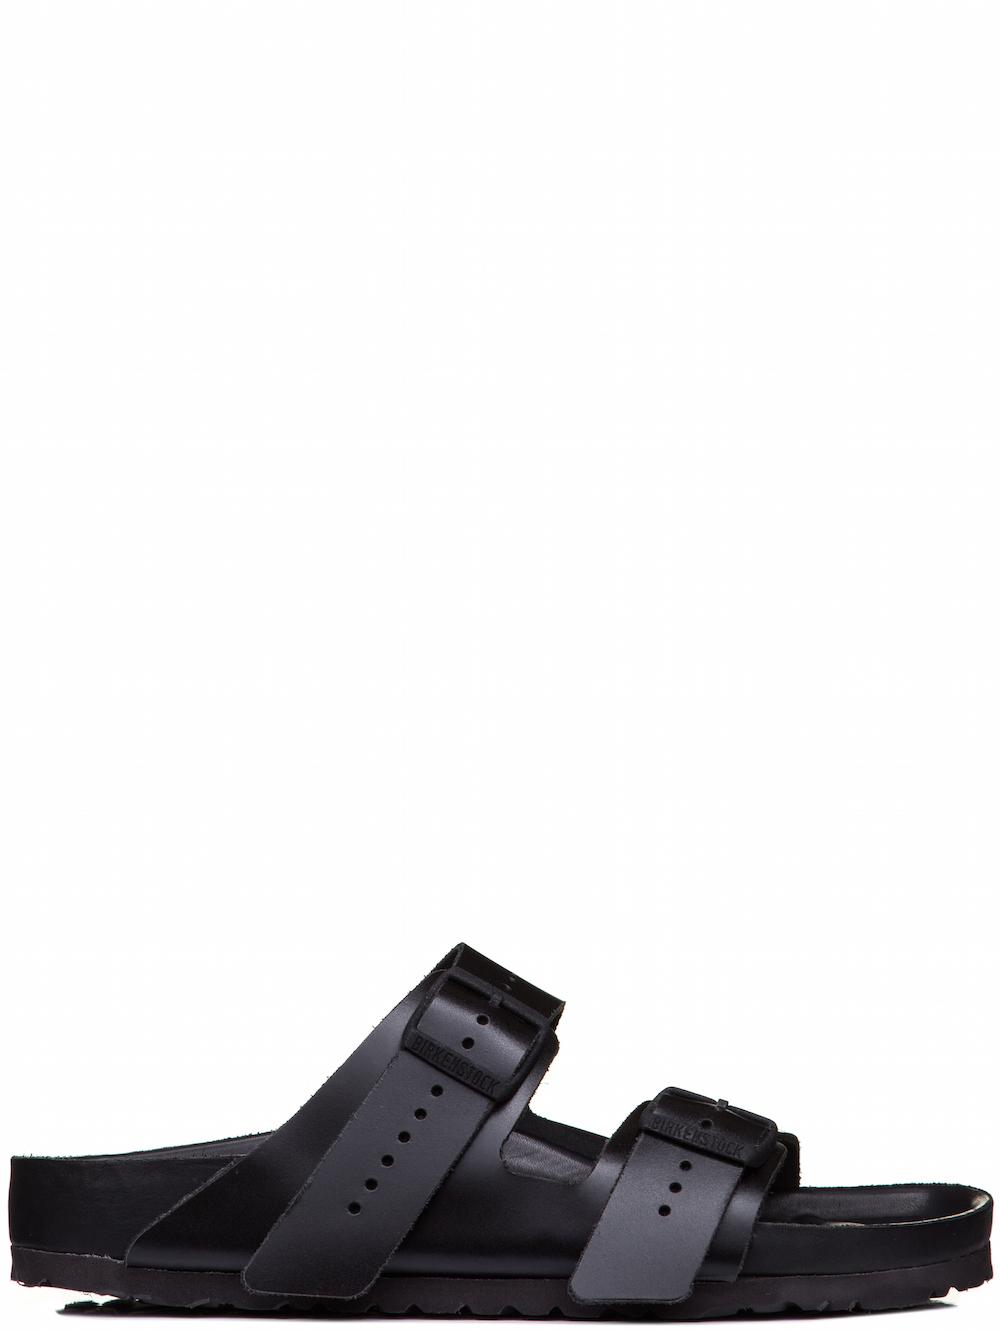 Rick OwensmpSitExy1C Edition Leather Arizona Sandals